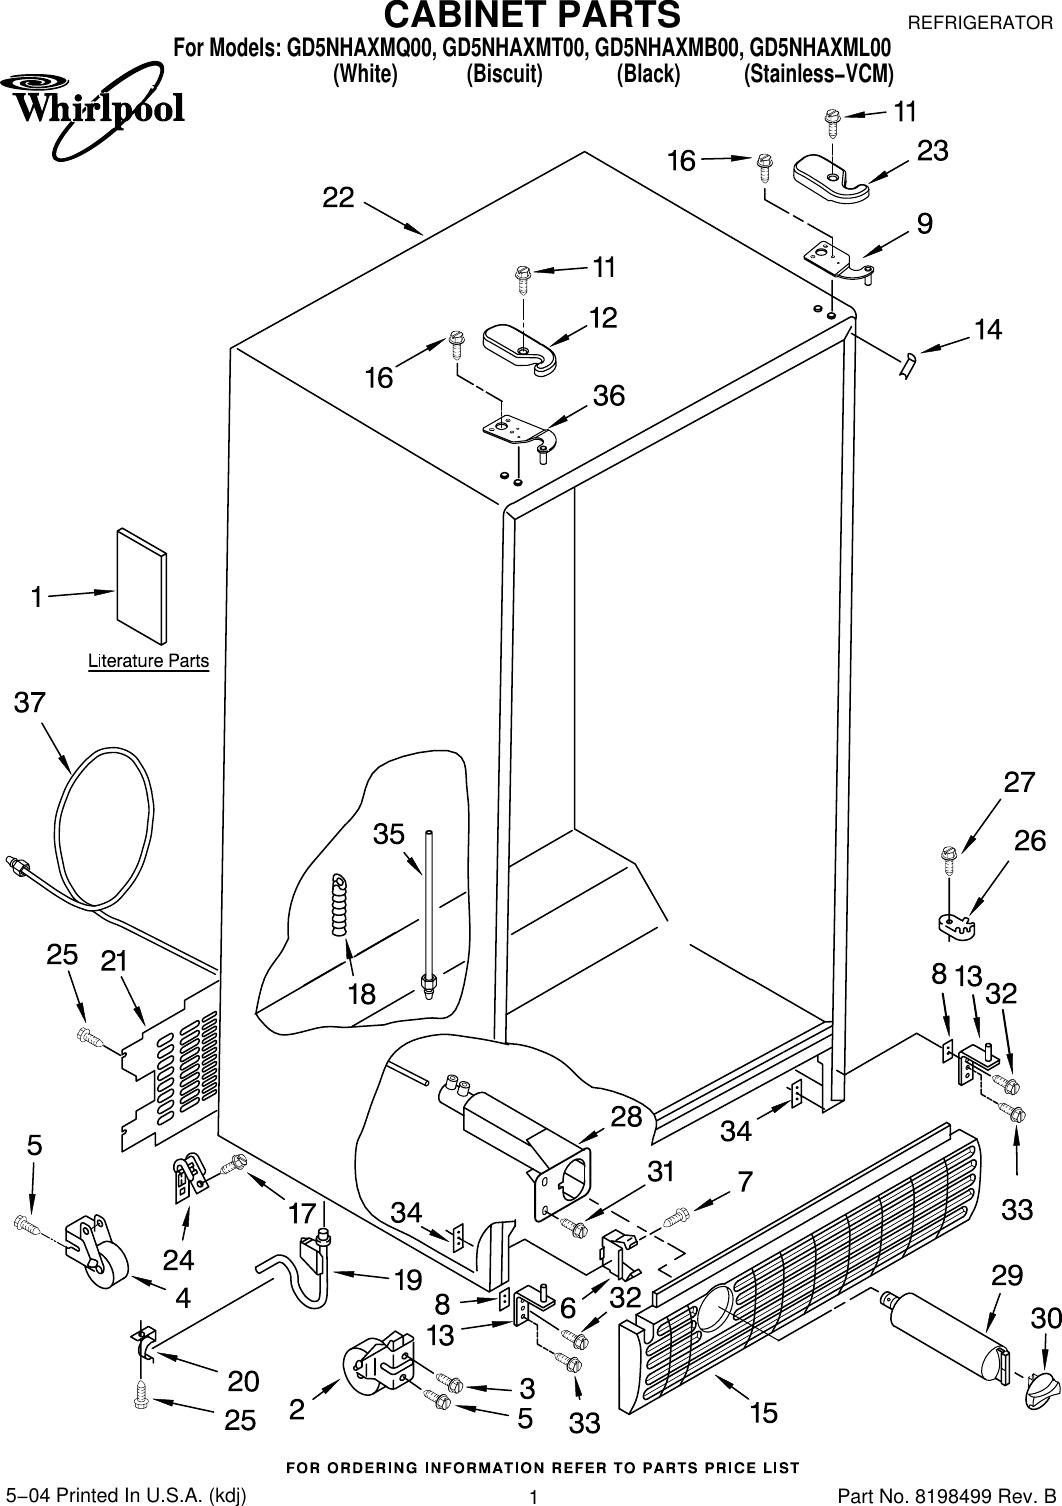 Whirlpool Refrigerator Gd5Nhaxmb00 Users Manual